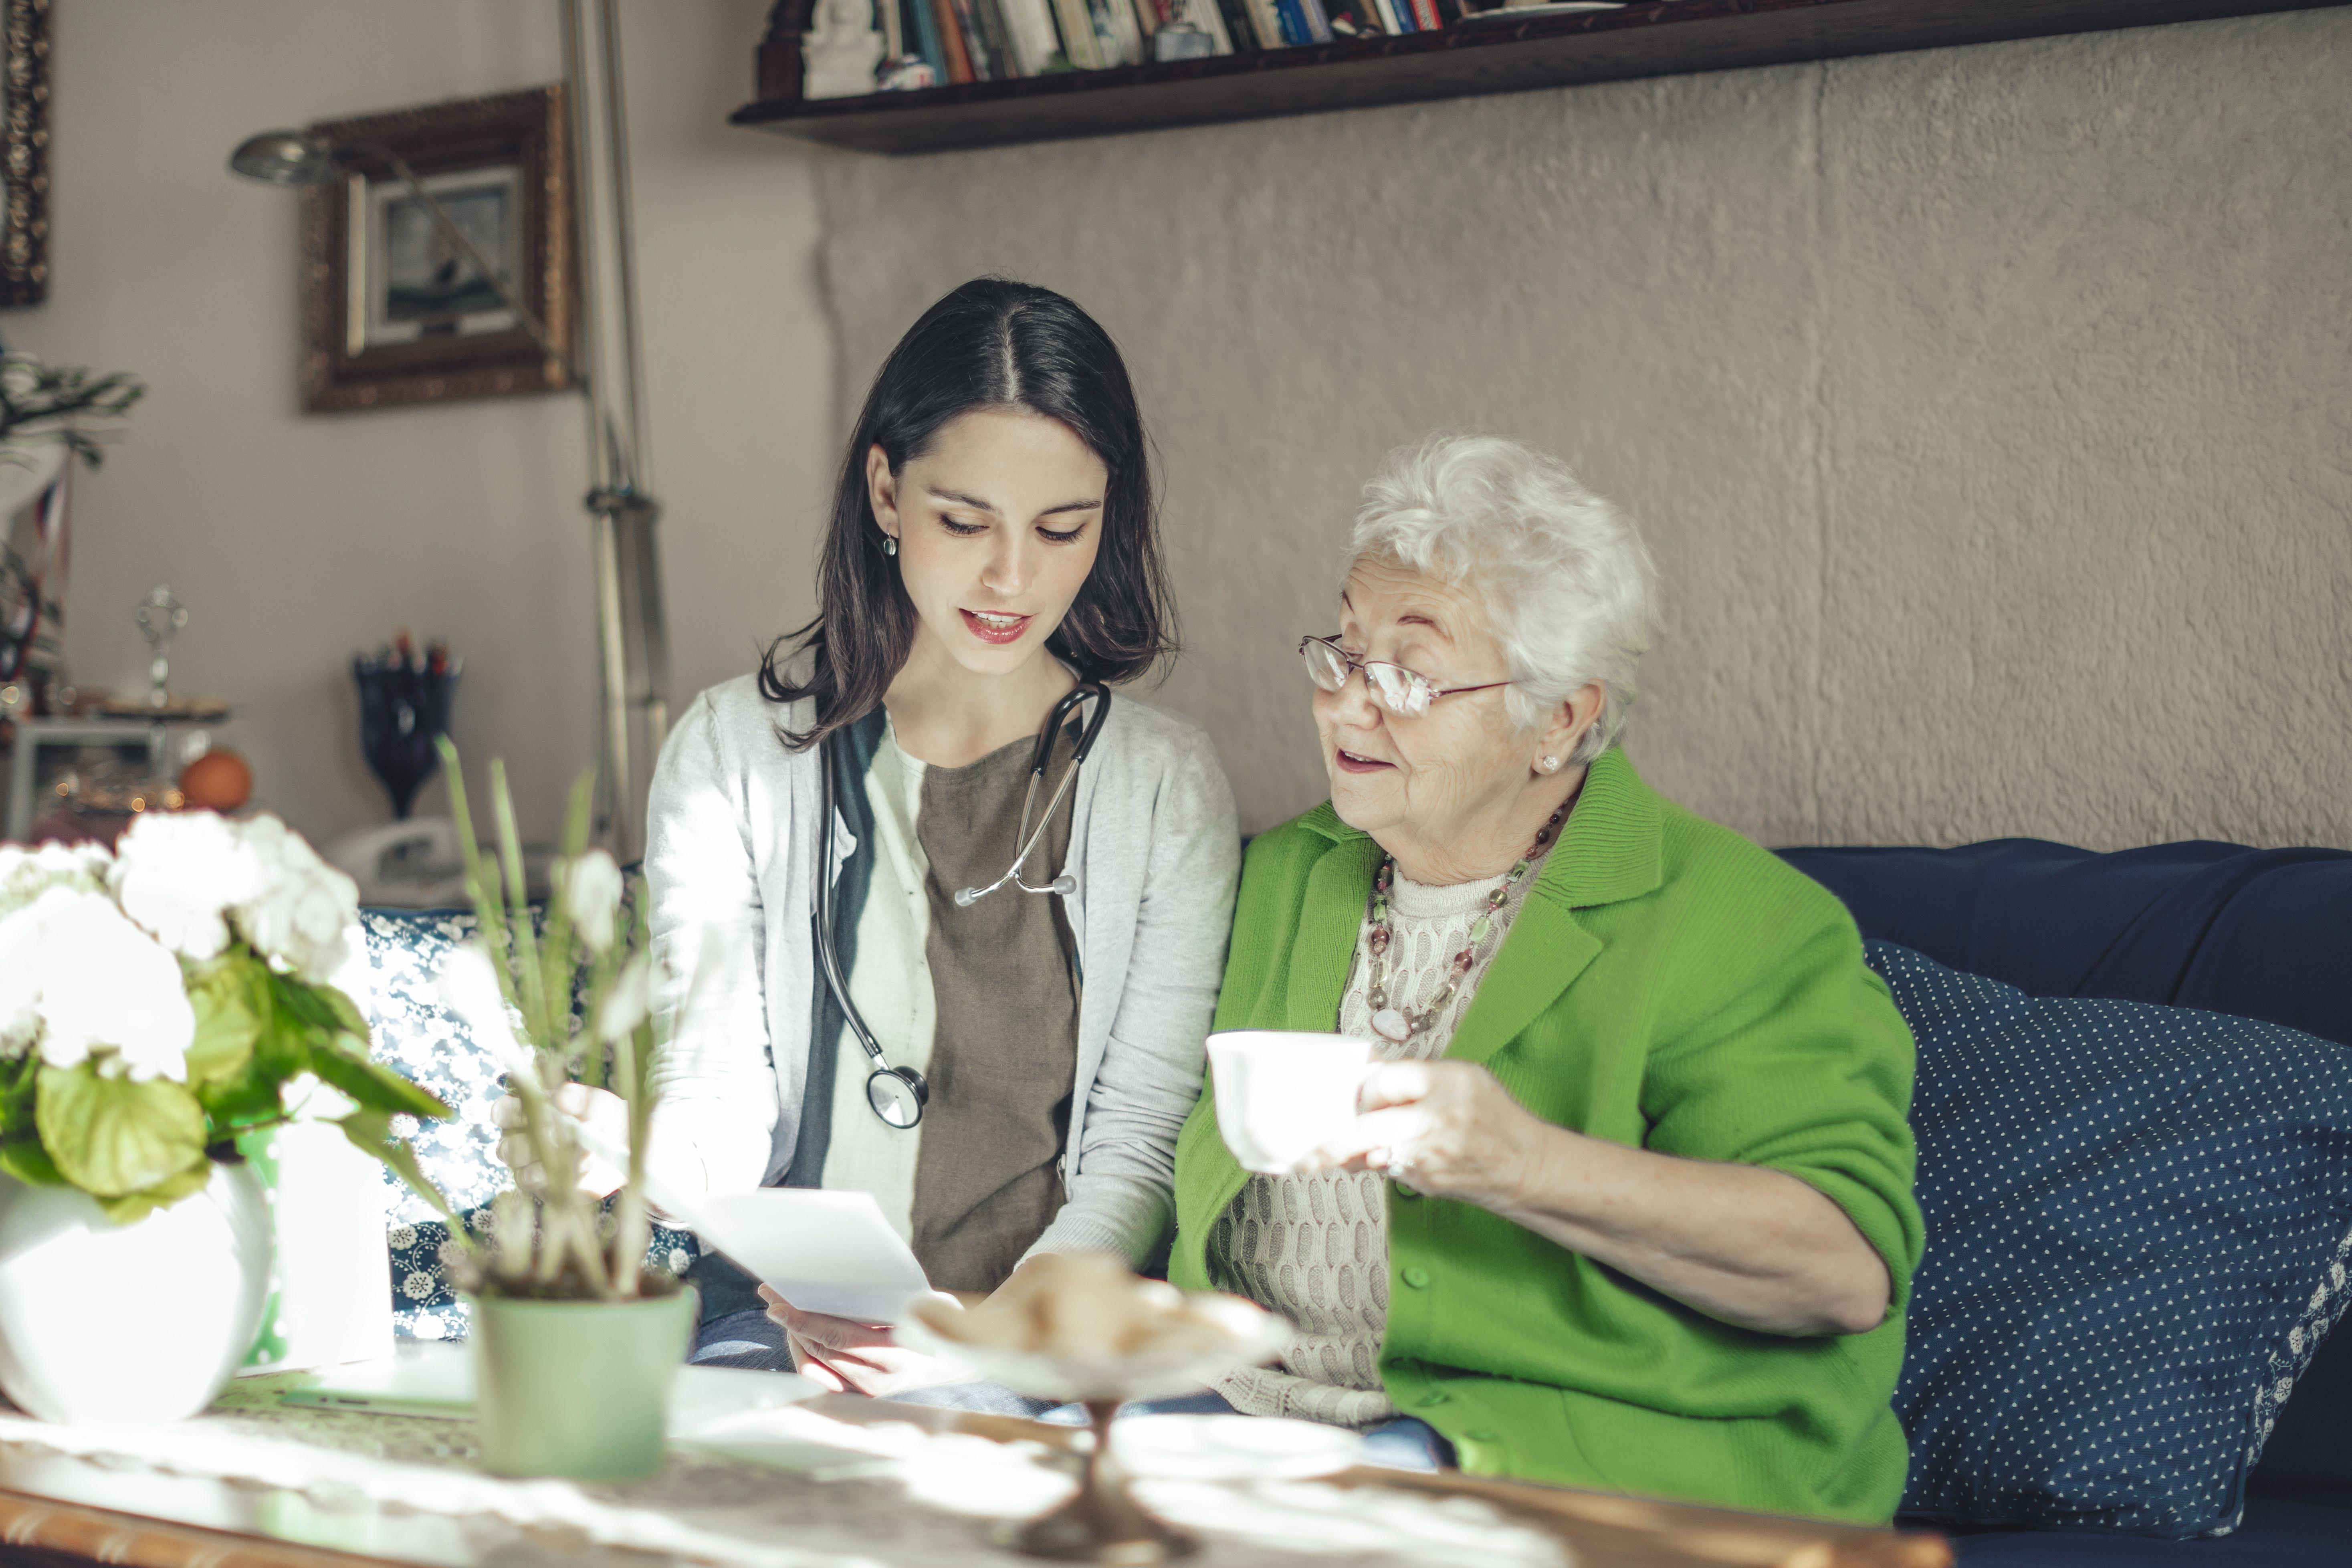 List of social work skills for your resume medical